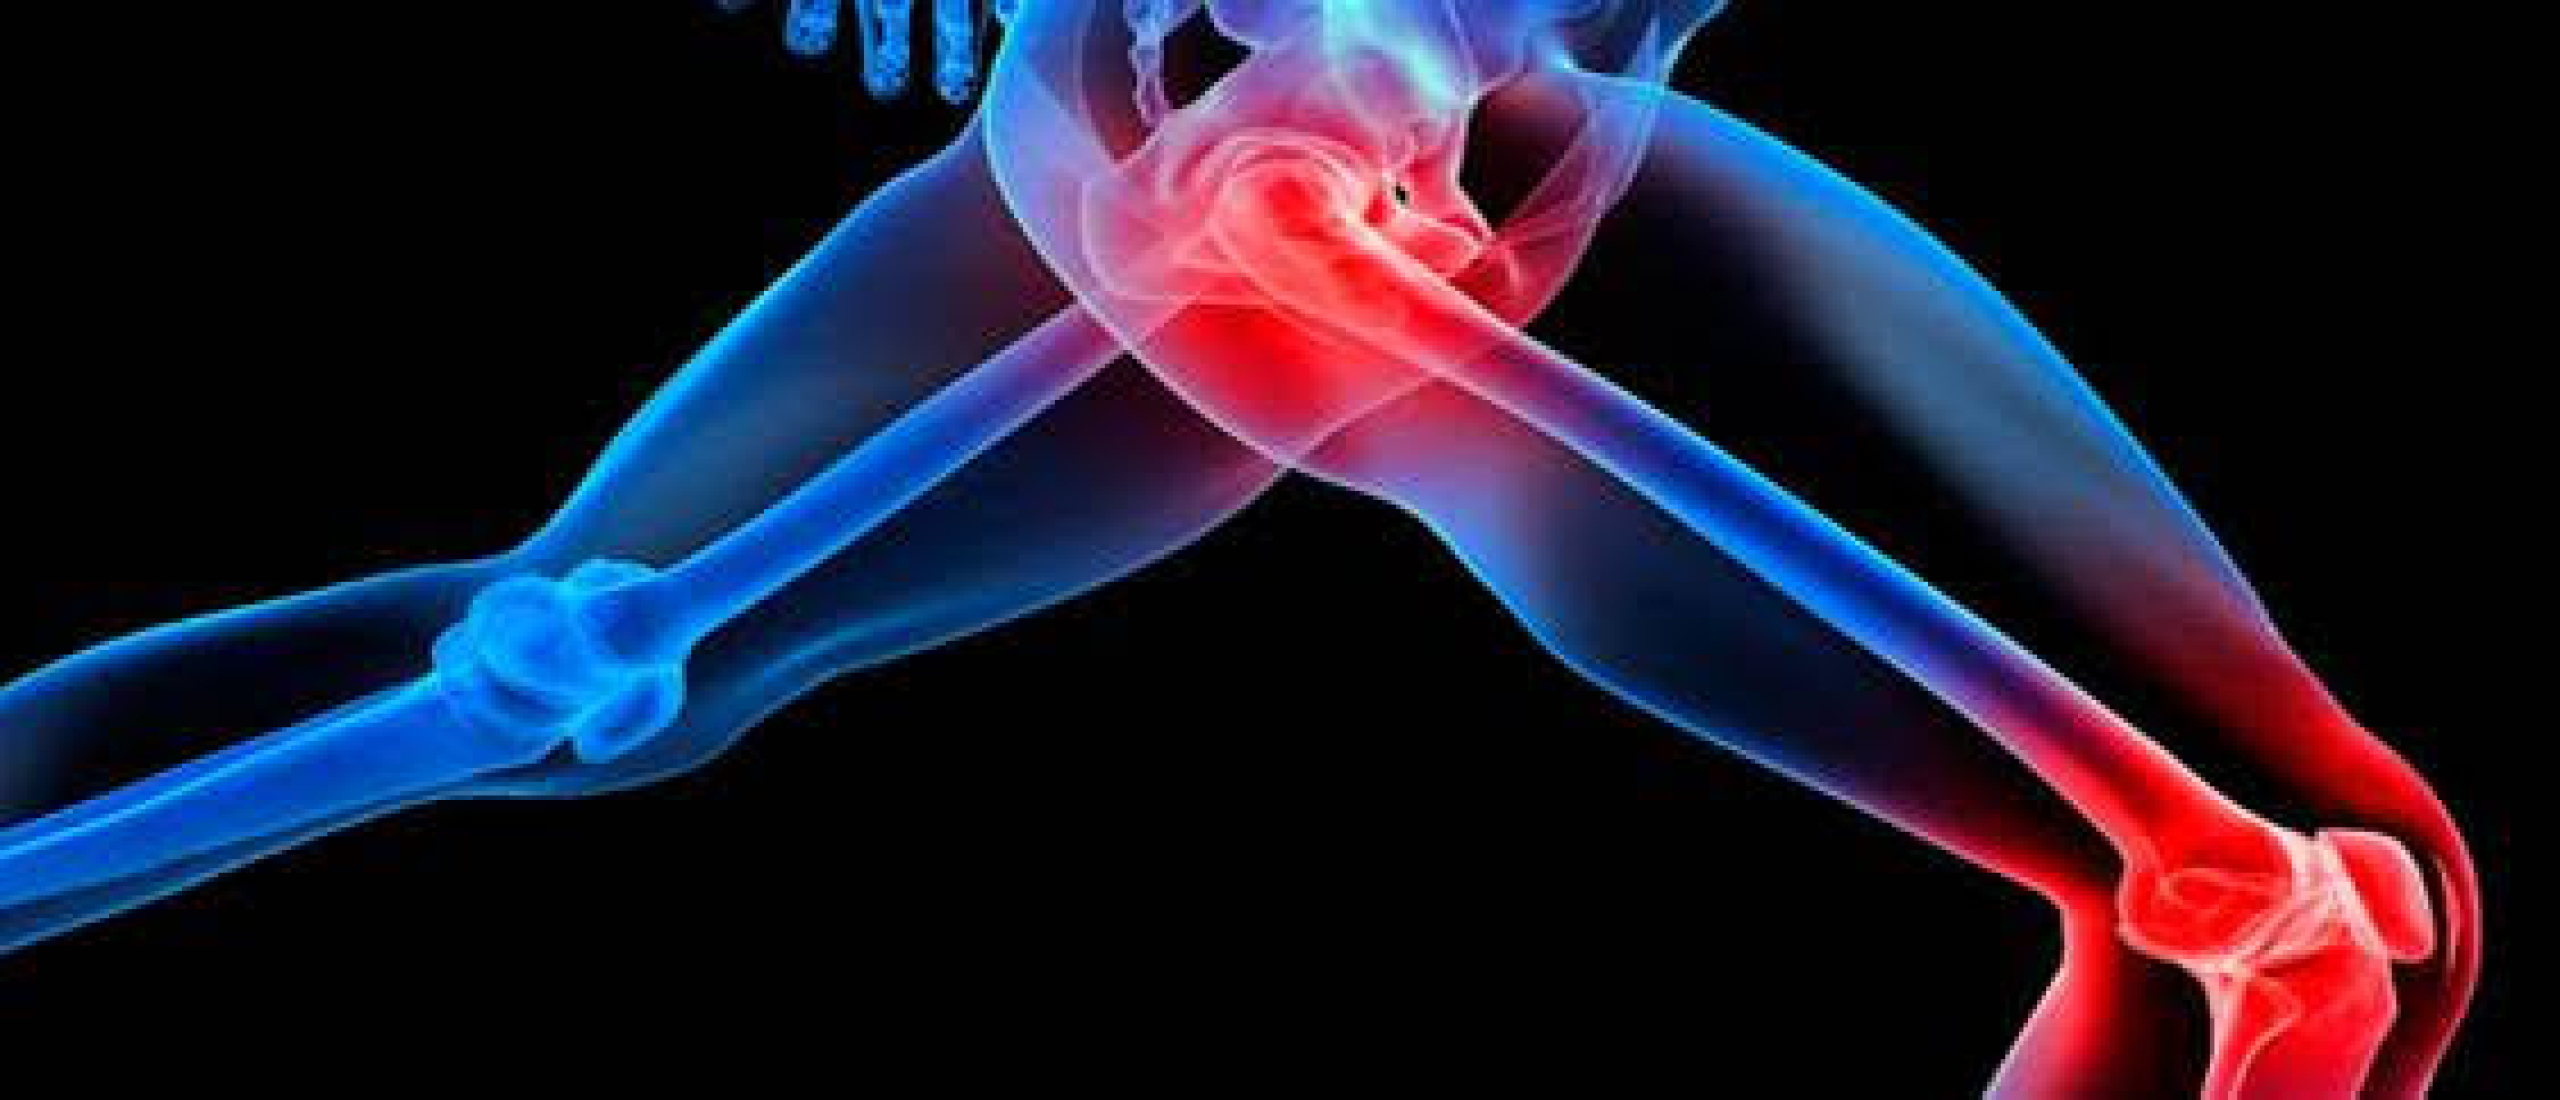 Kraakbeen herstel met hulp van PEMF